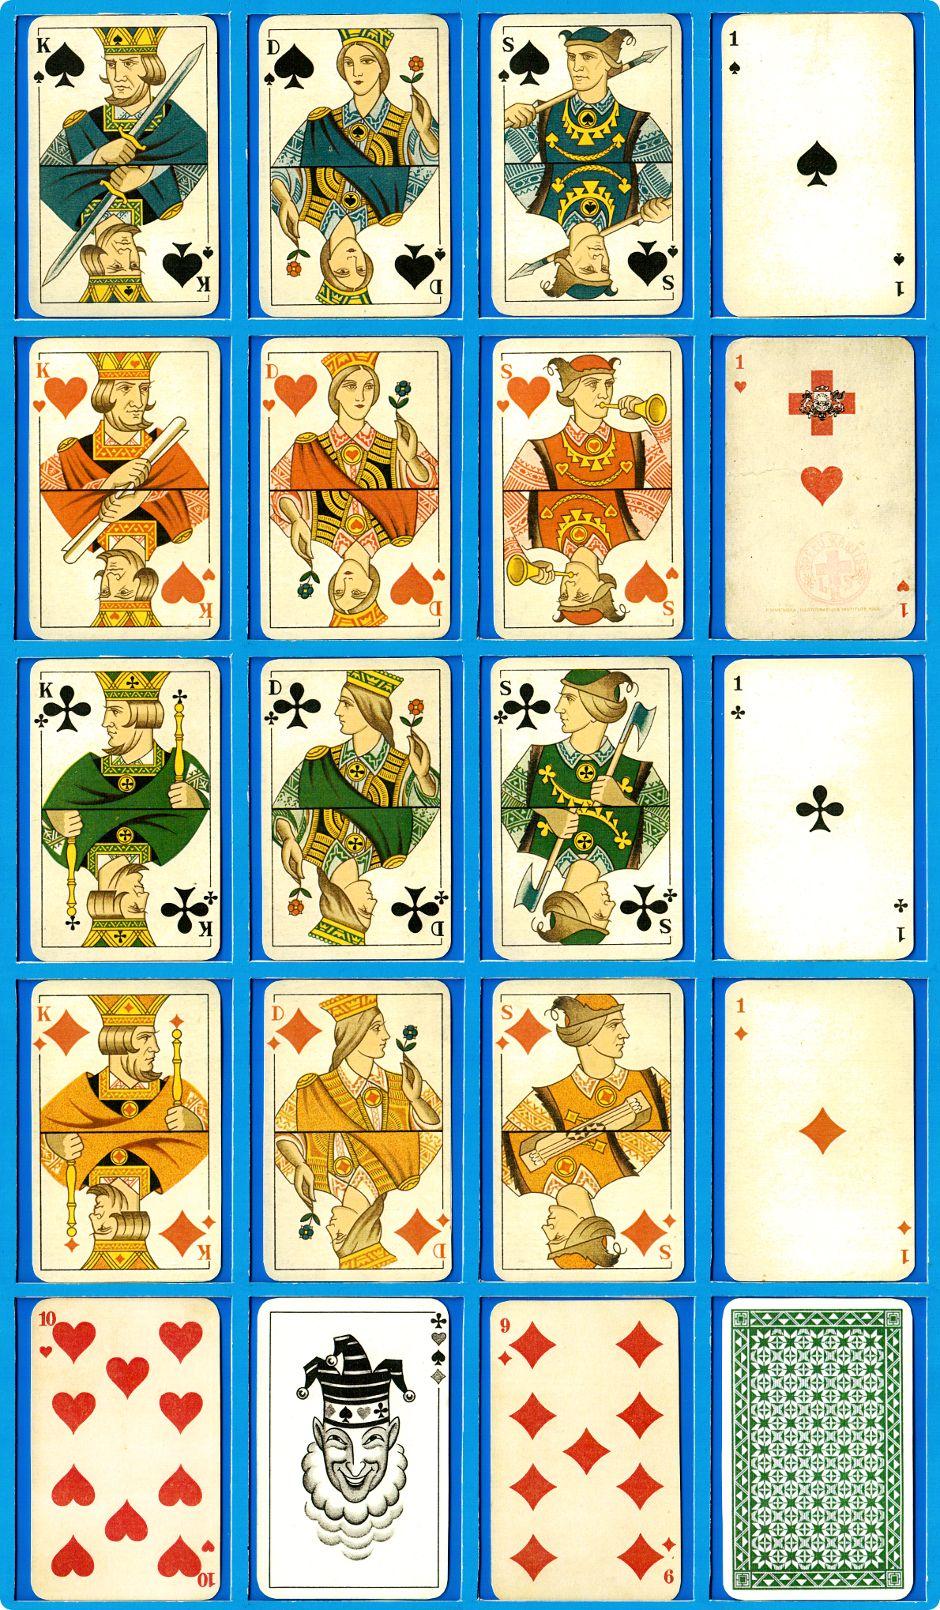 Cards designed by Alfreds Scwedrevitz, 1936